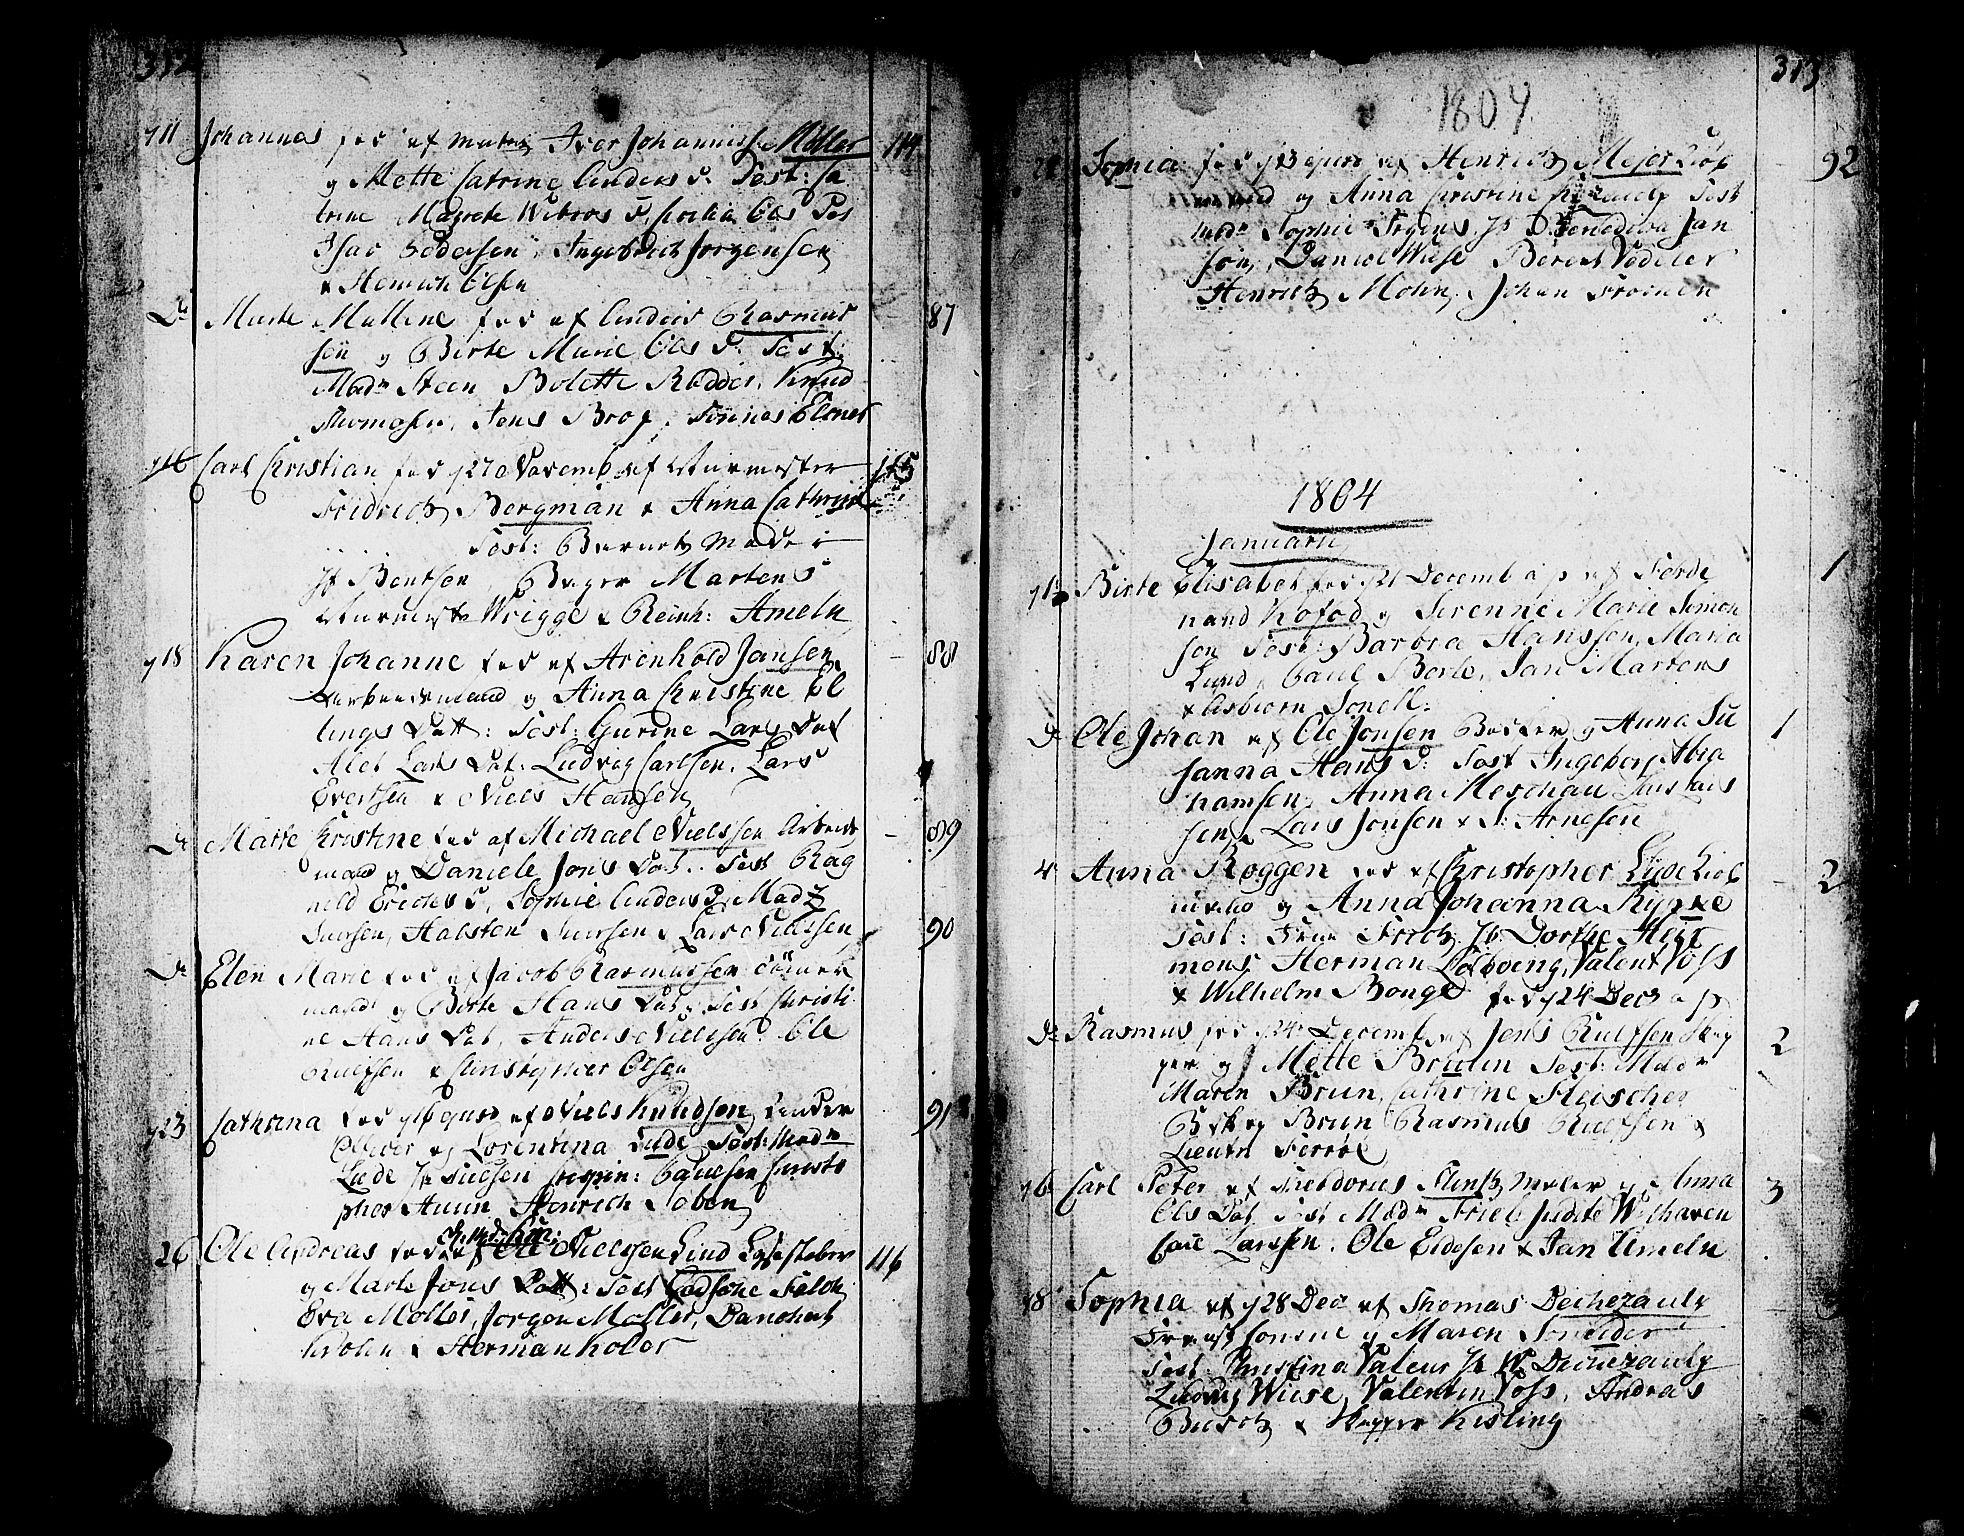 SAB, Domkirken sokneprestembete, H/Haa/L0004: Ministerialbok nr. A 4, 1763-1820, s. 312-313